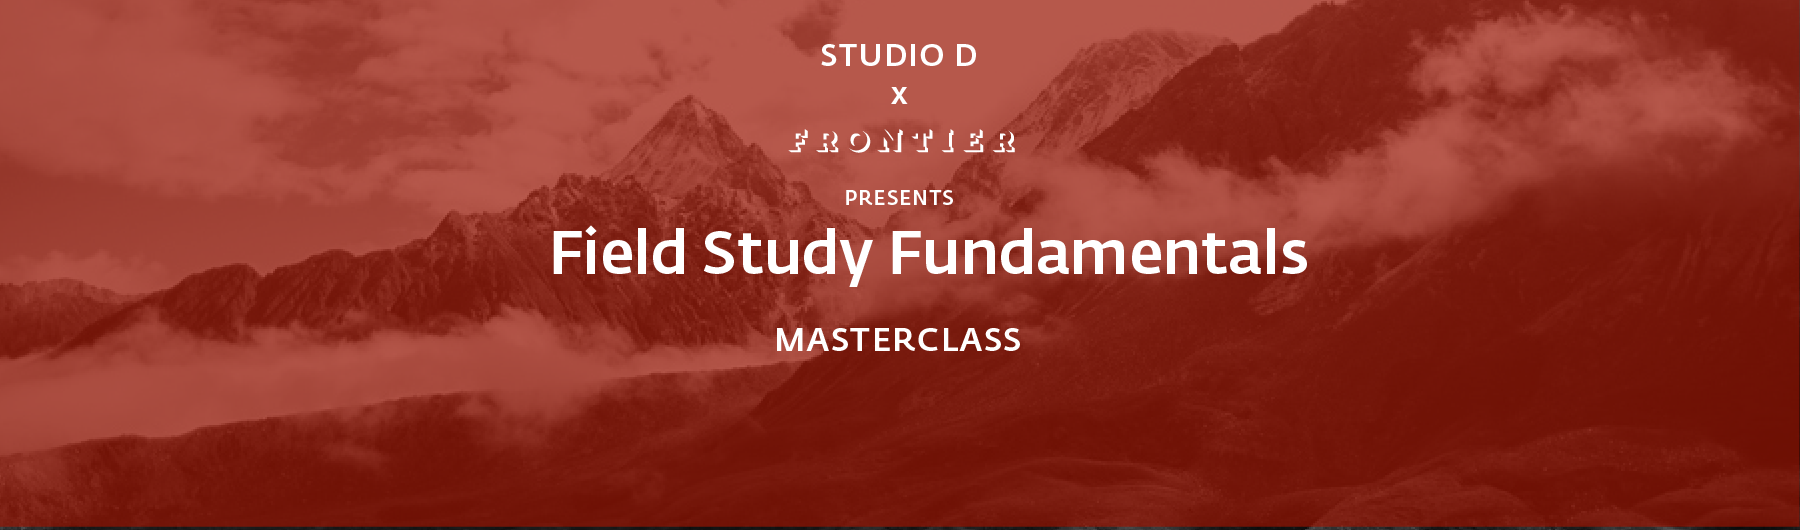 Field Study Fundamentals Masterclass, 30 March 2020, Toronto